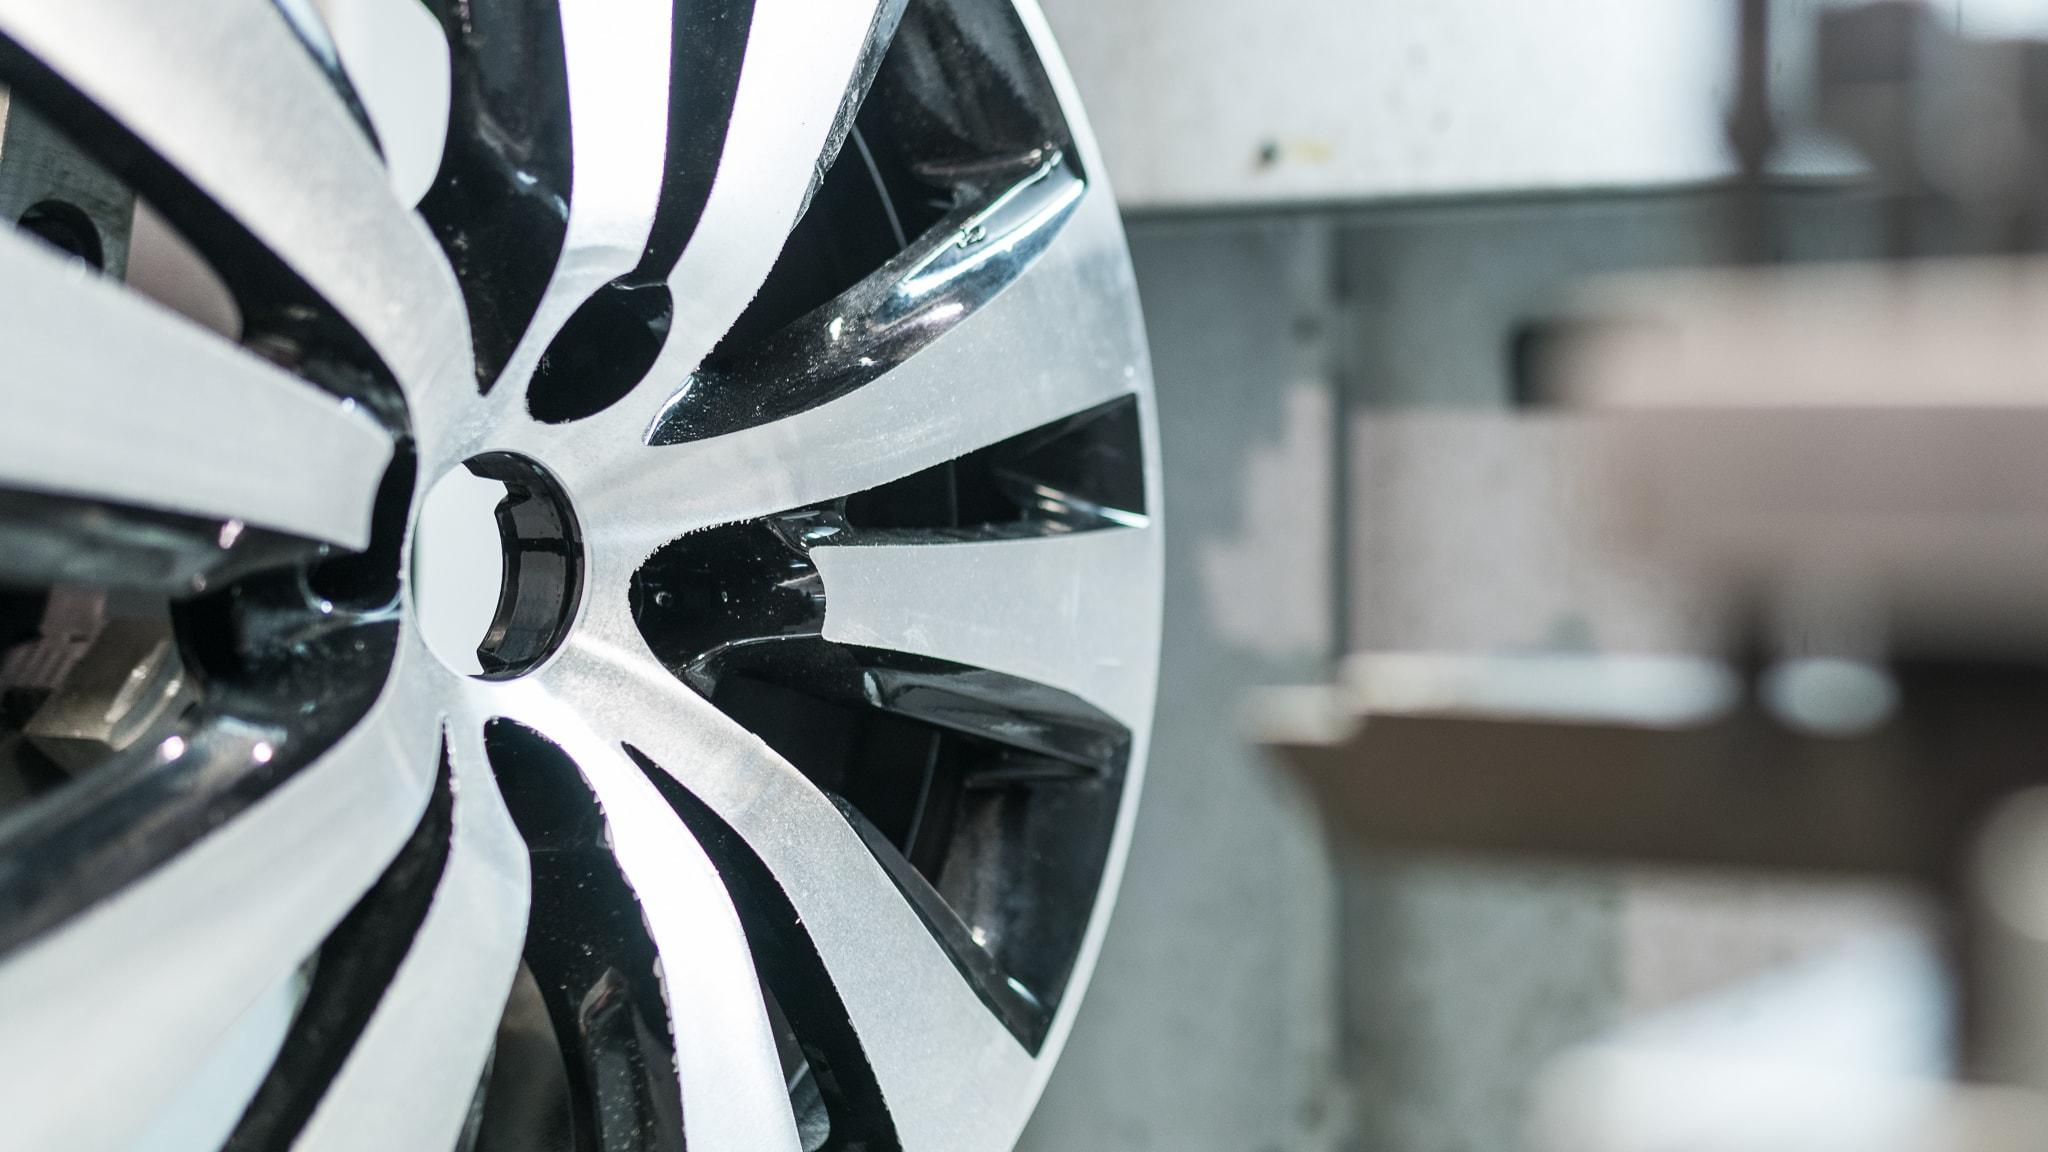 Entrepreneur launches first mobile alloy wheel refurbishment service